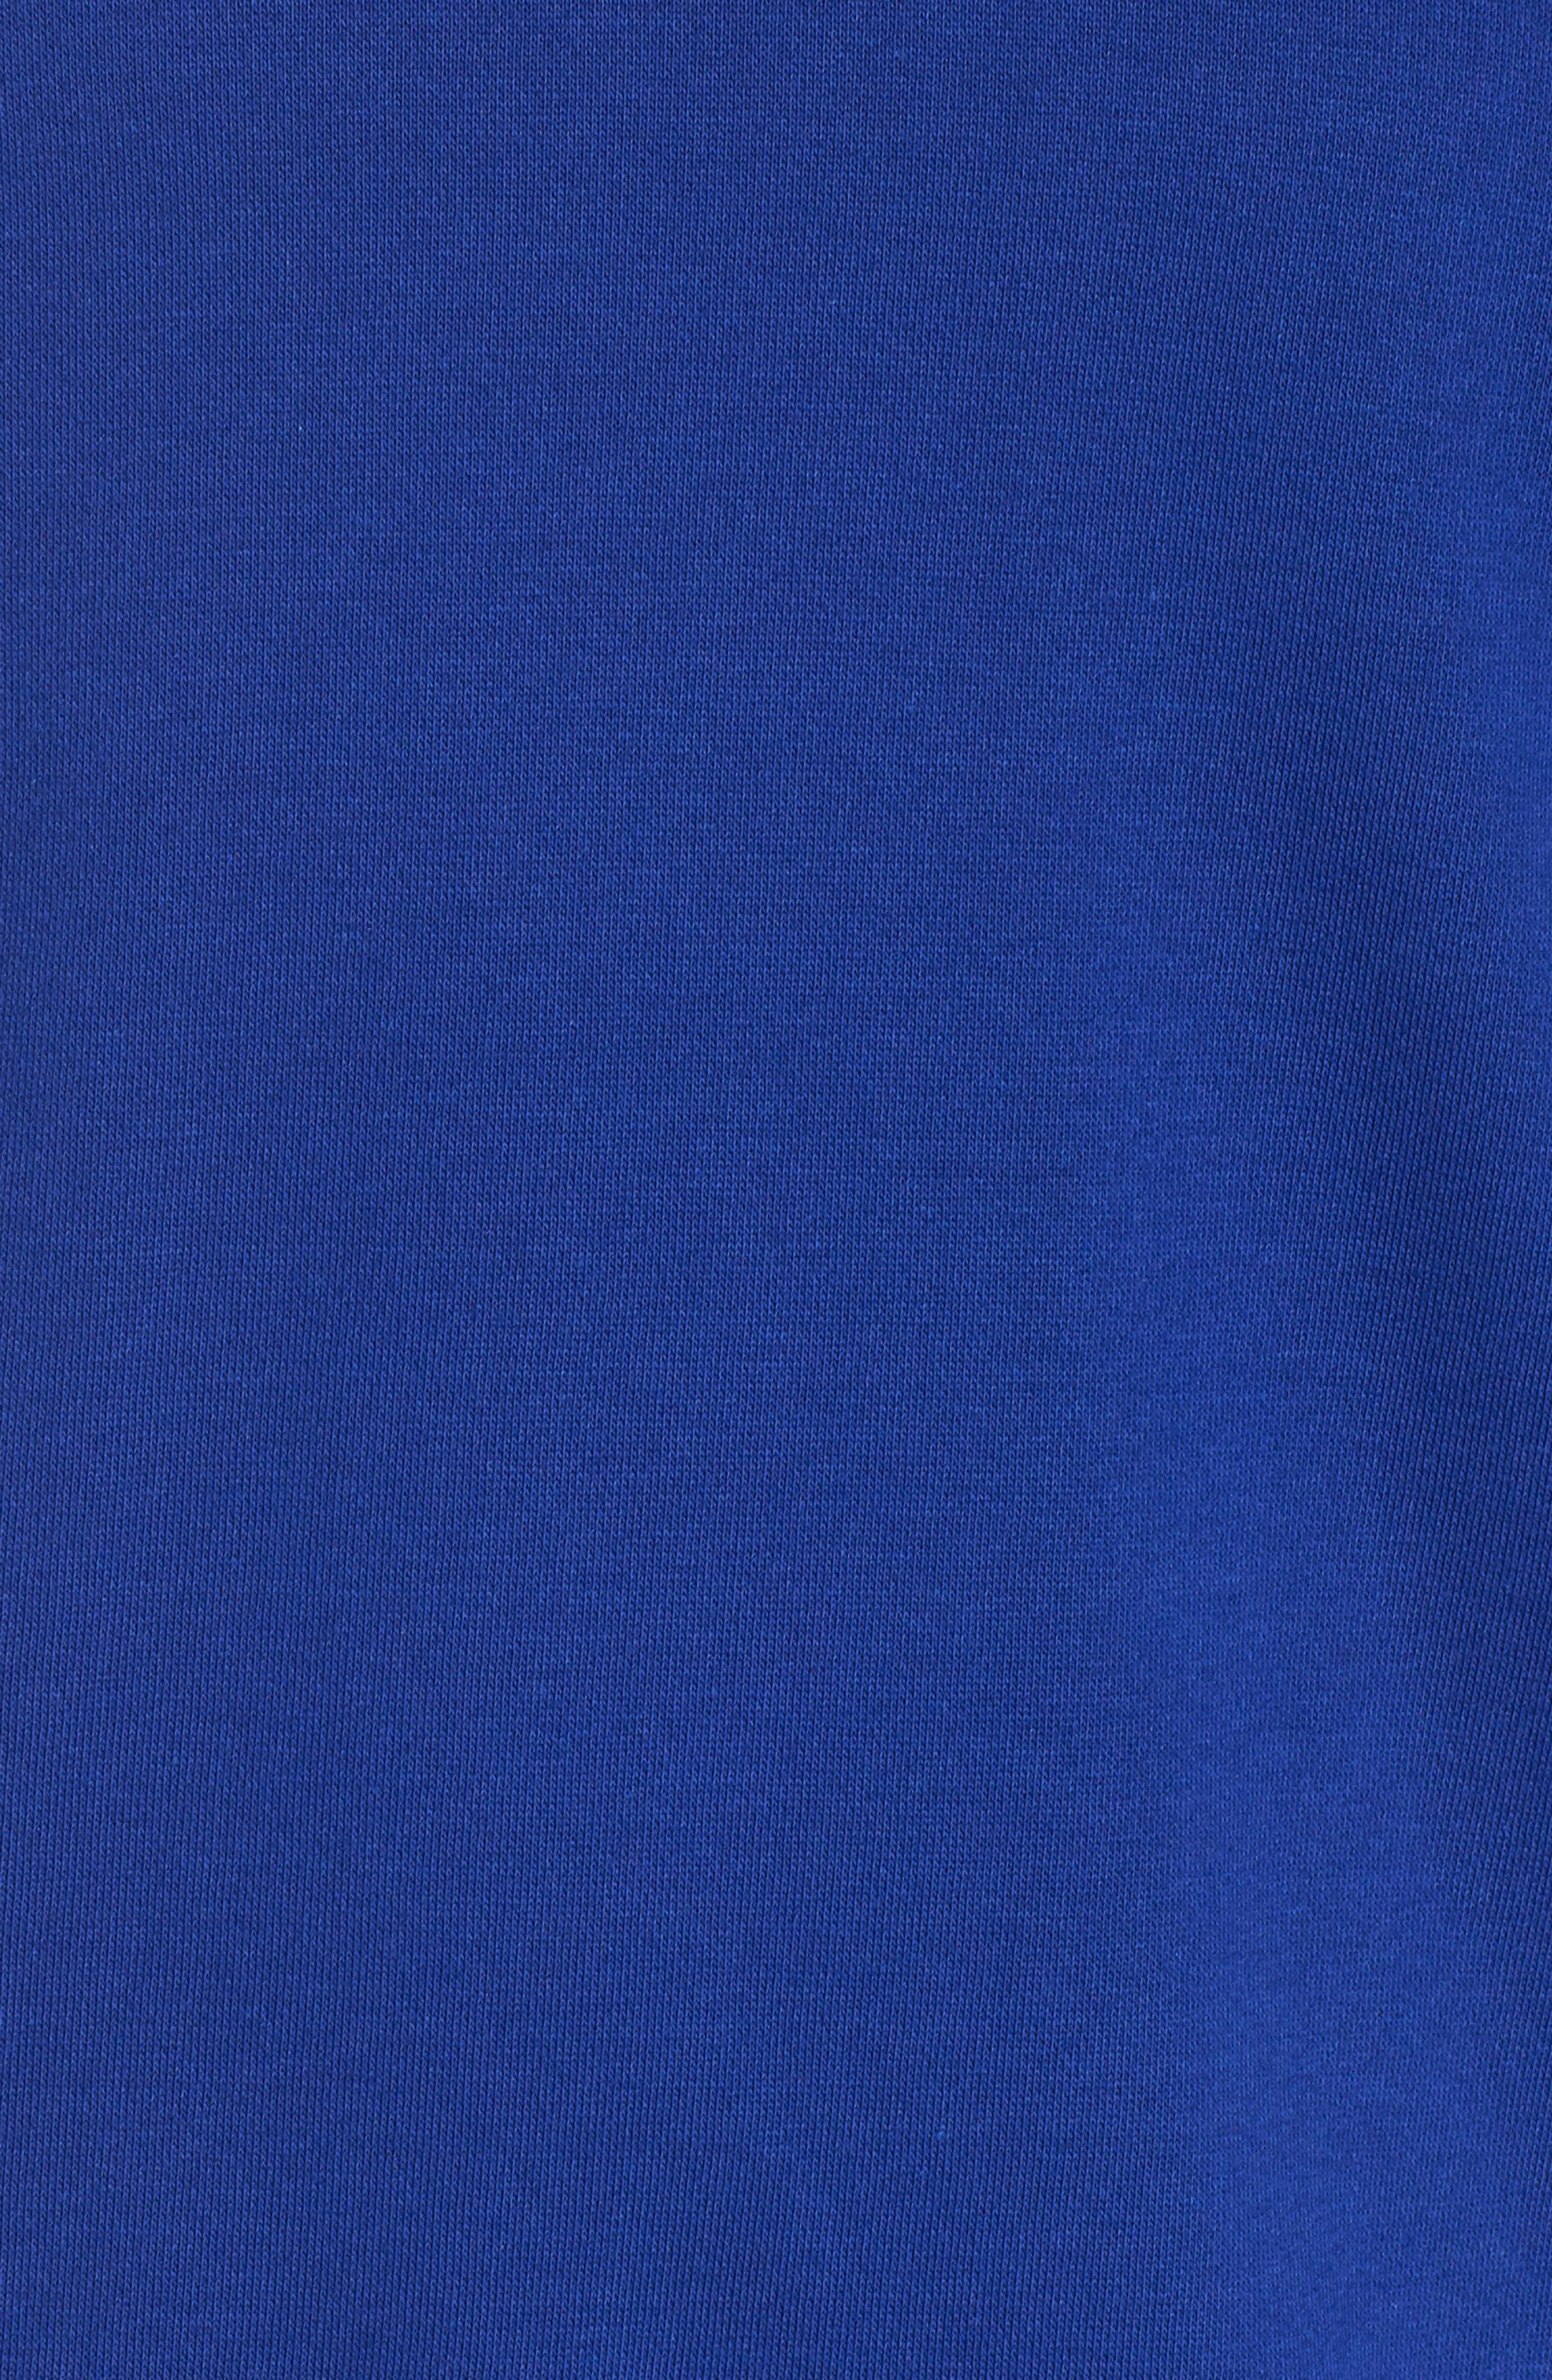 adidas Oversize Crewneck Sweatshirt,                             Alternate thumbnail 6, color,                             MYSTERY INK